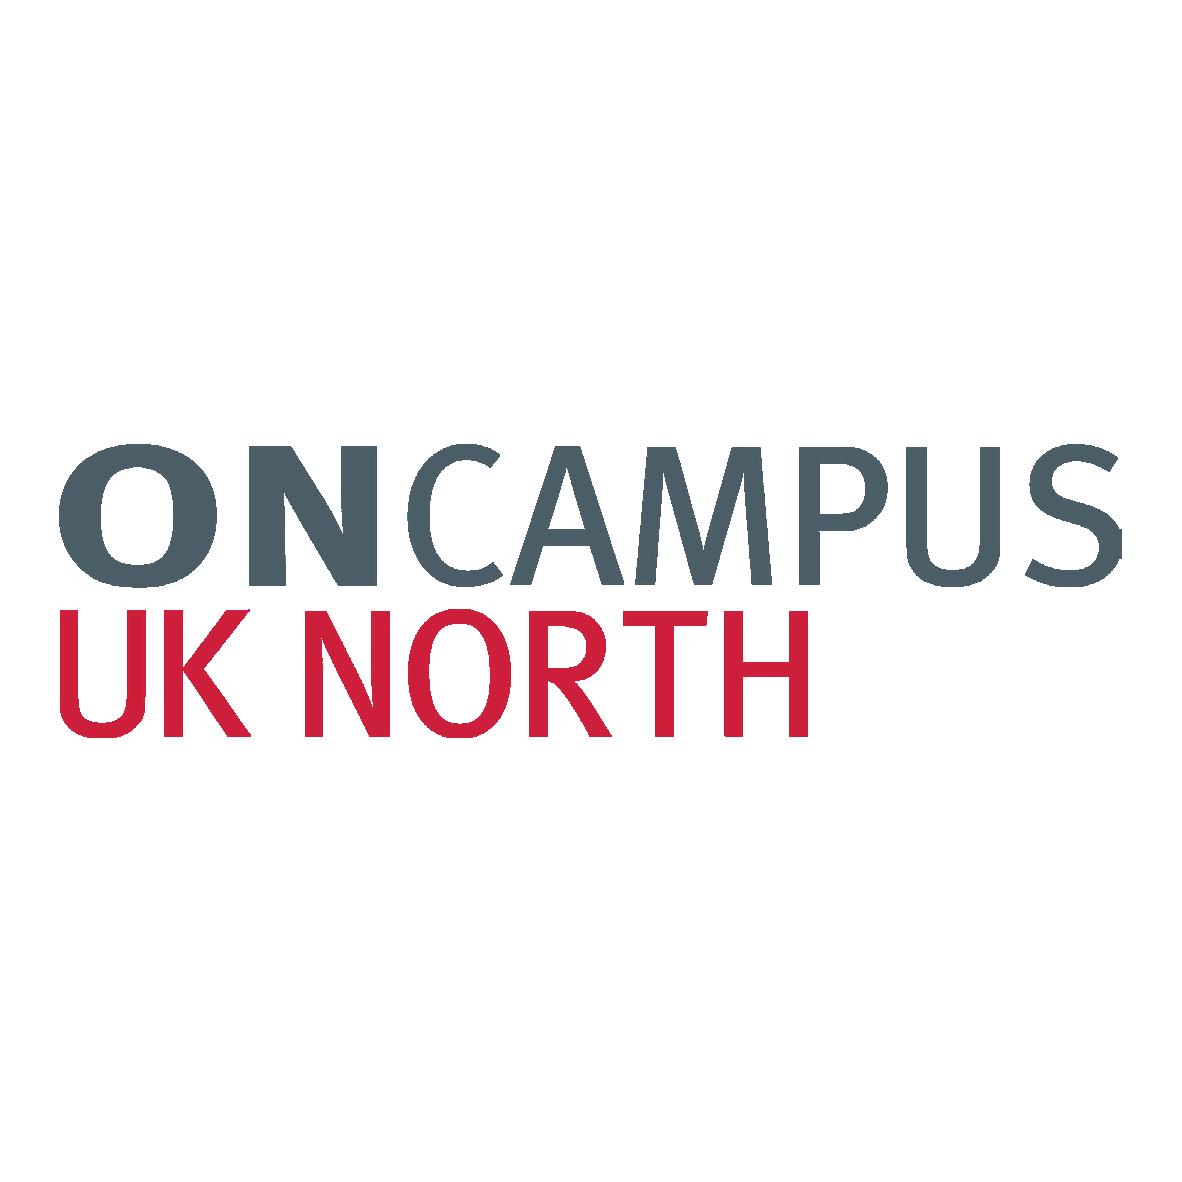 Oncampus Uk North